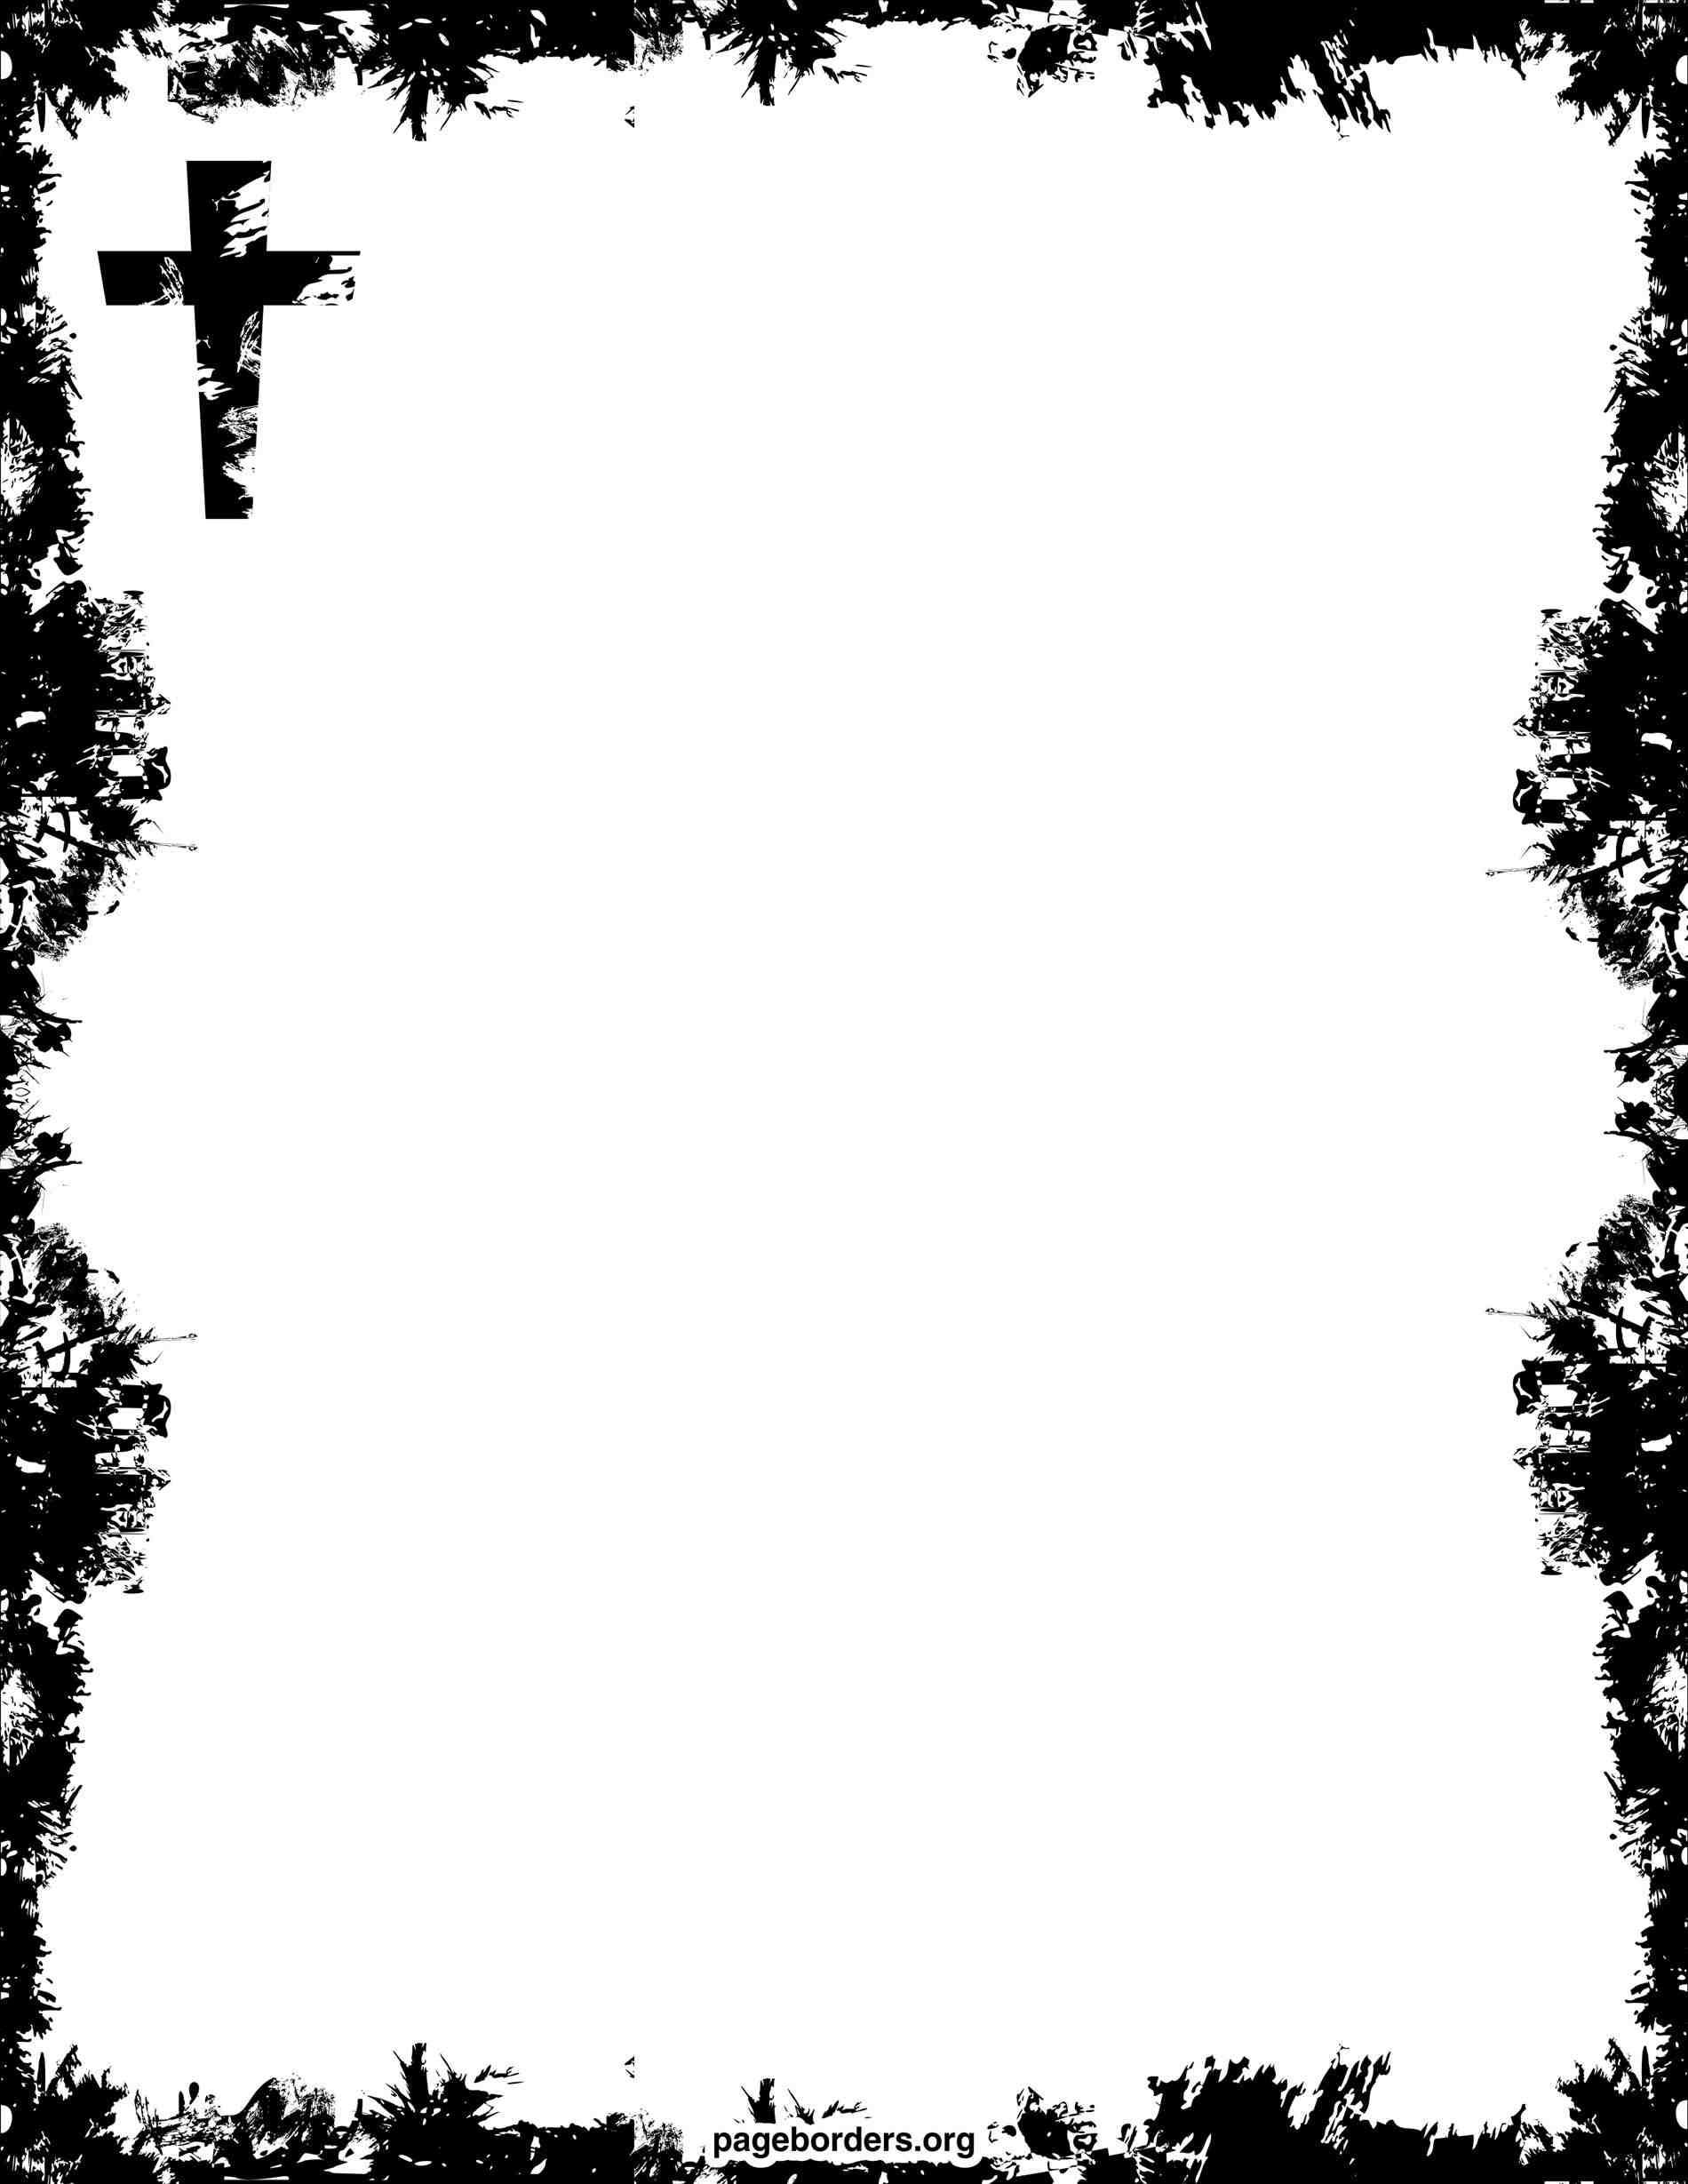 1900x2458 Christmas Nativity Border Clip Art Free cheminee.website